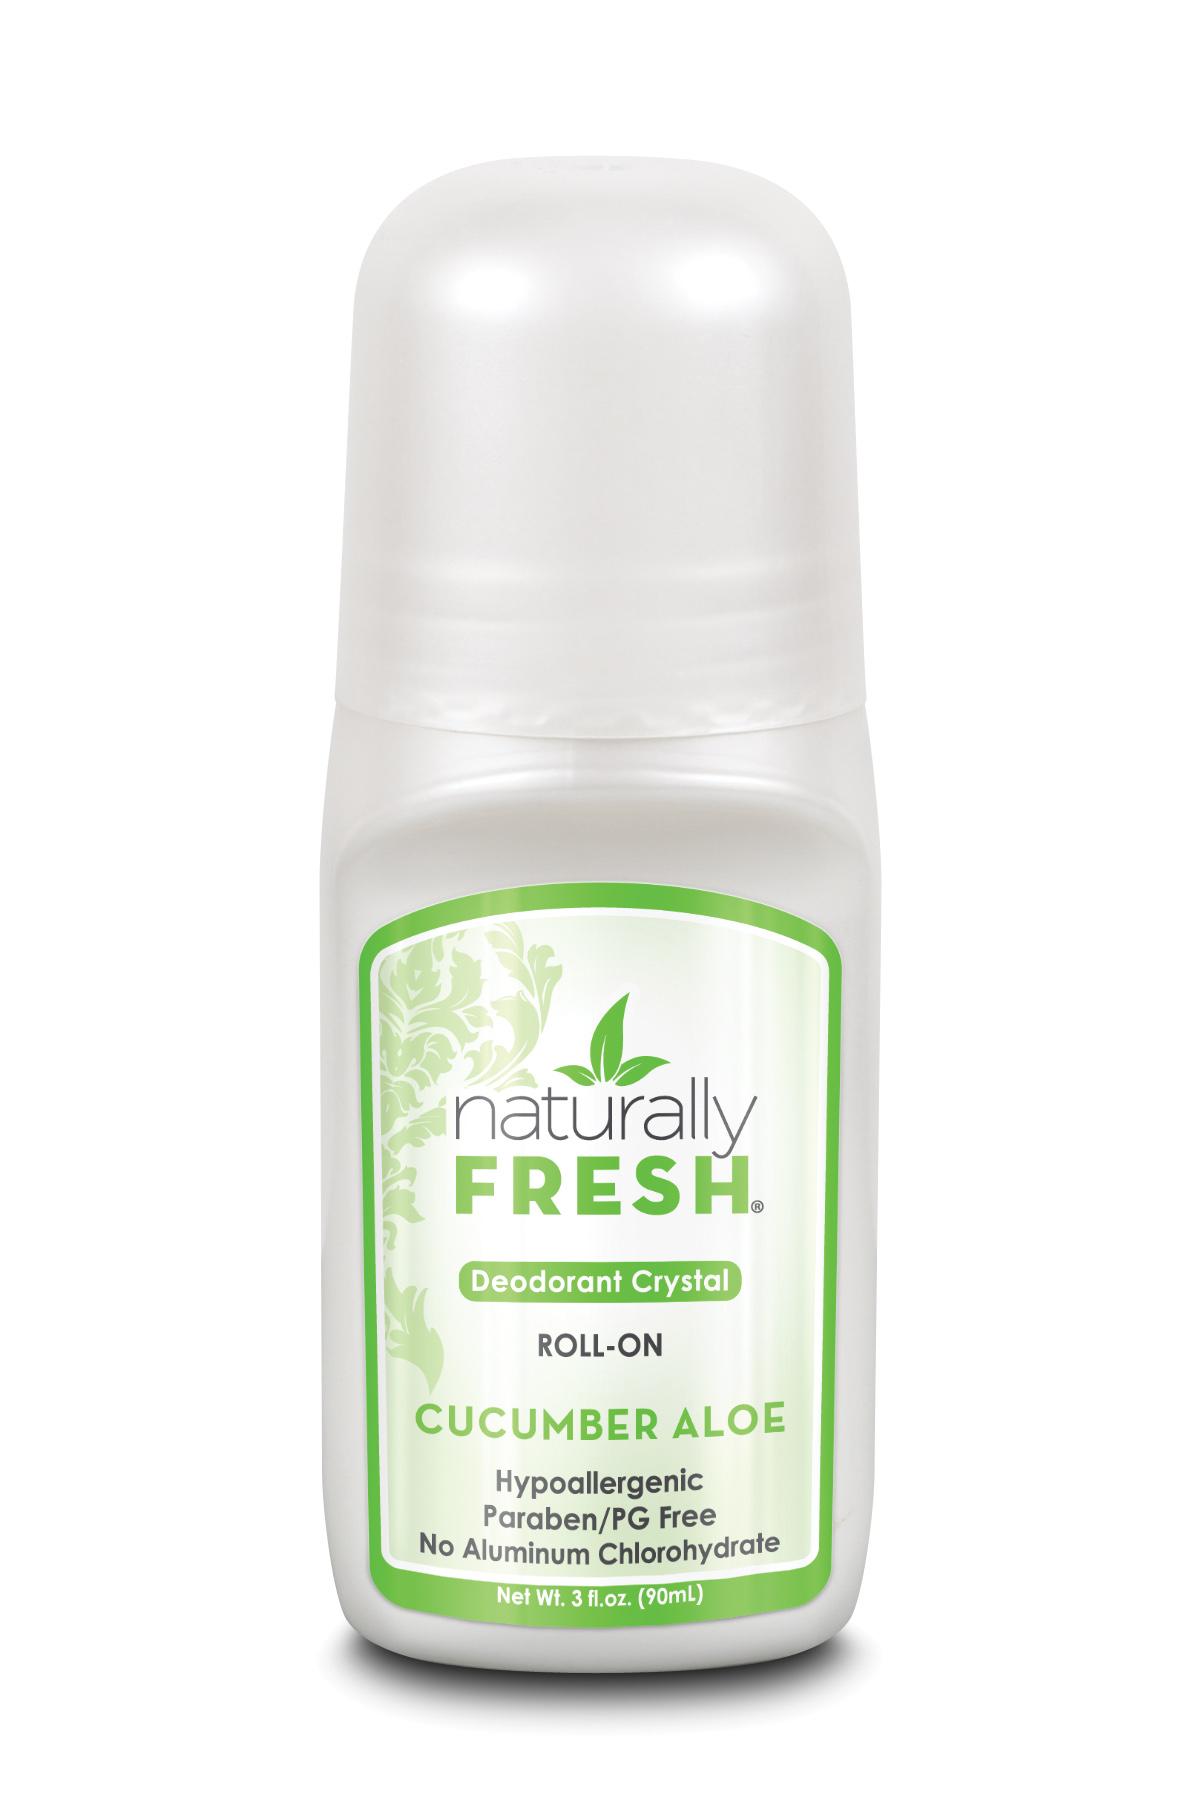 Deodorant Crystal Roll-On Cucumber Aloe 90ml